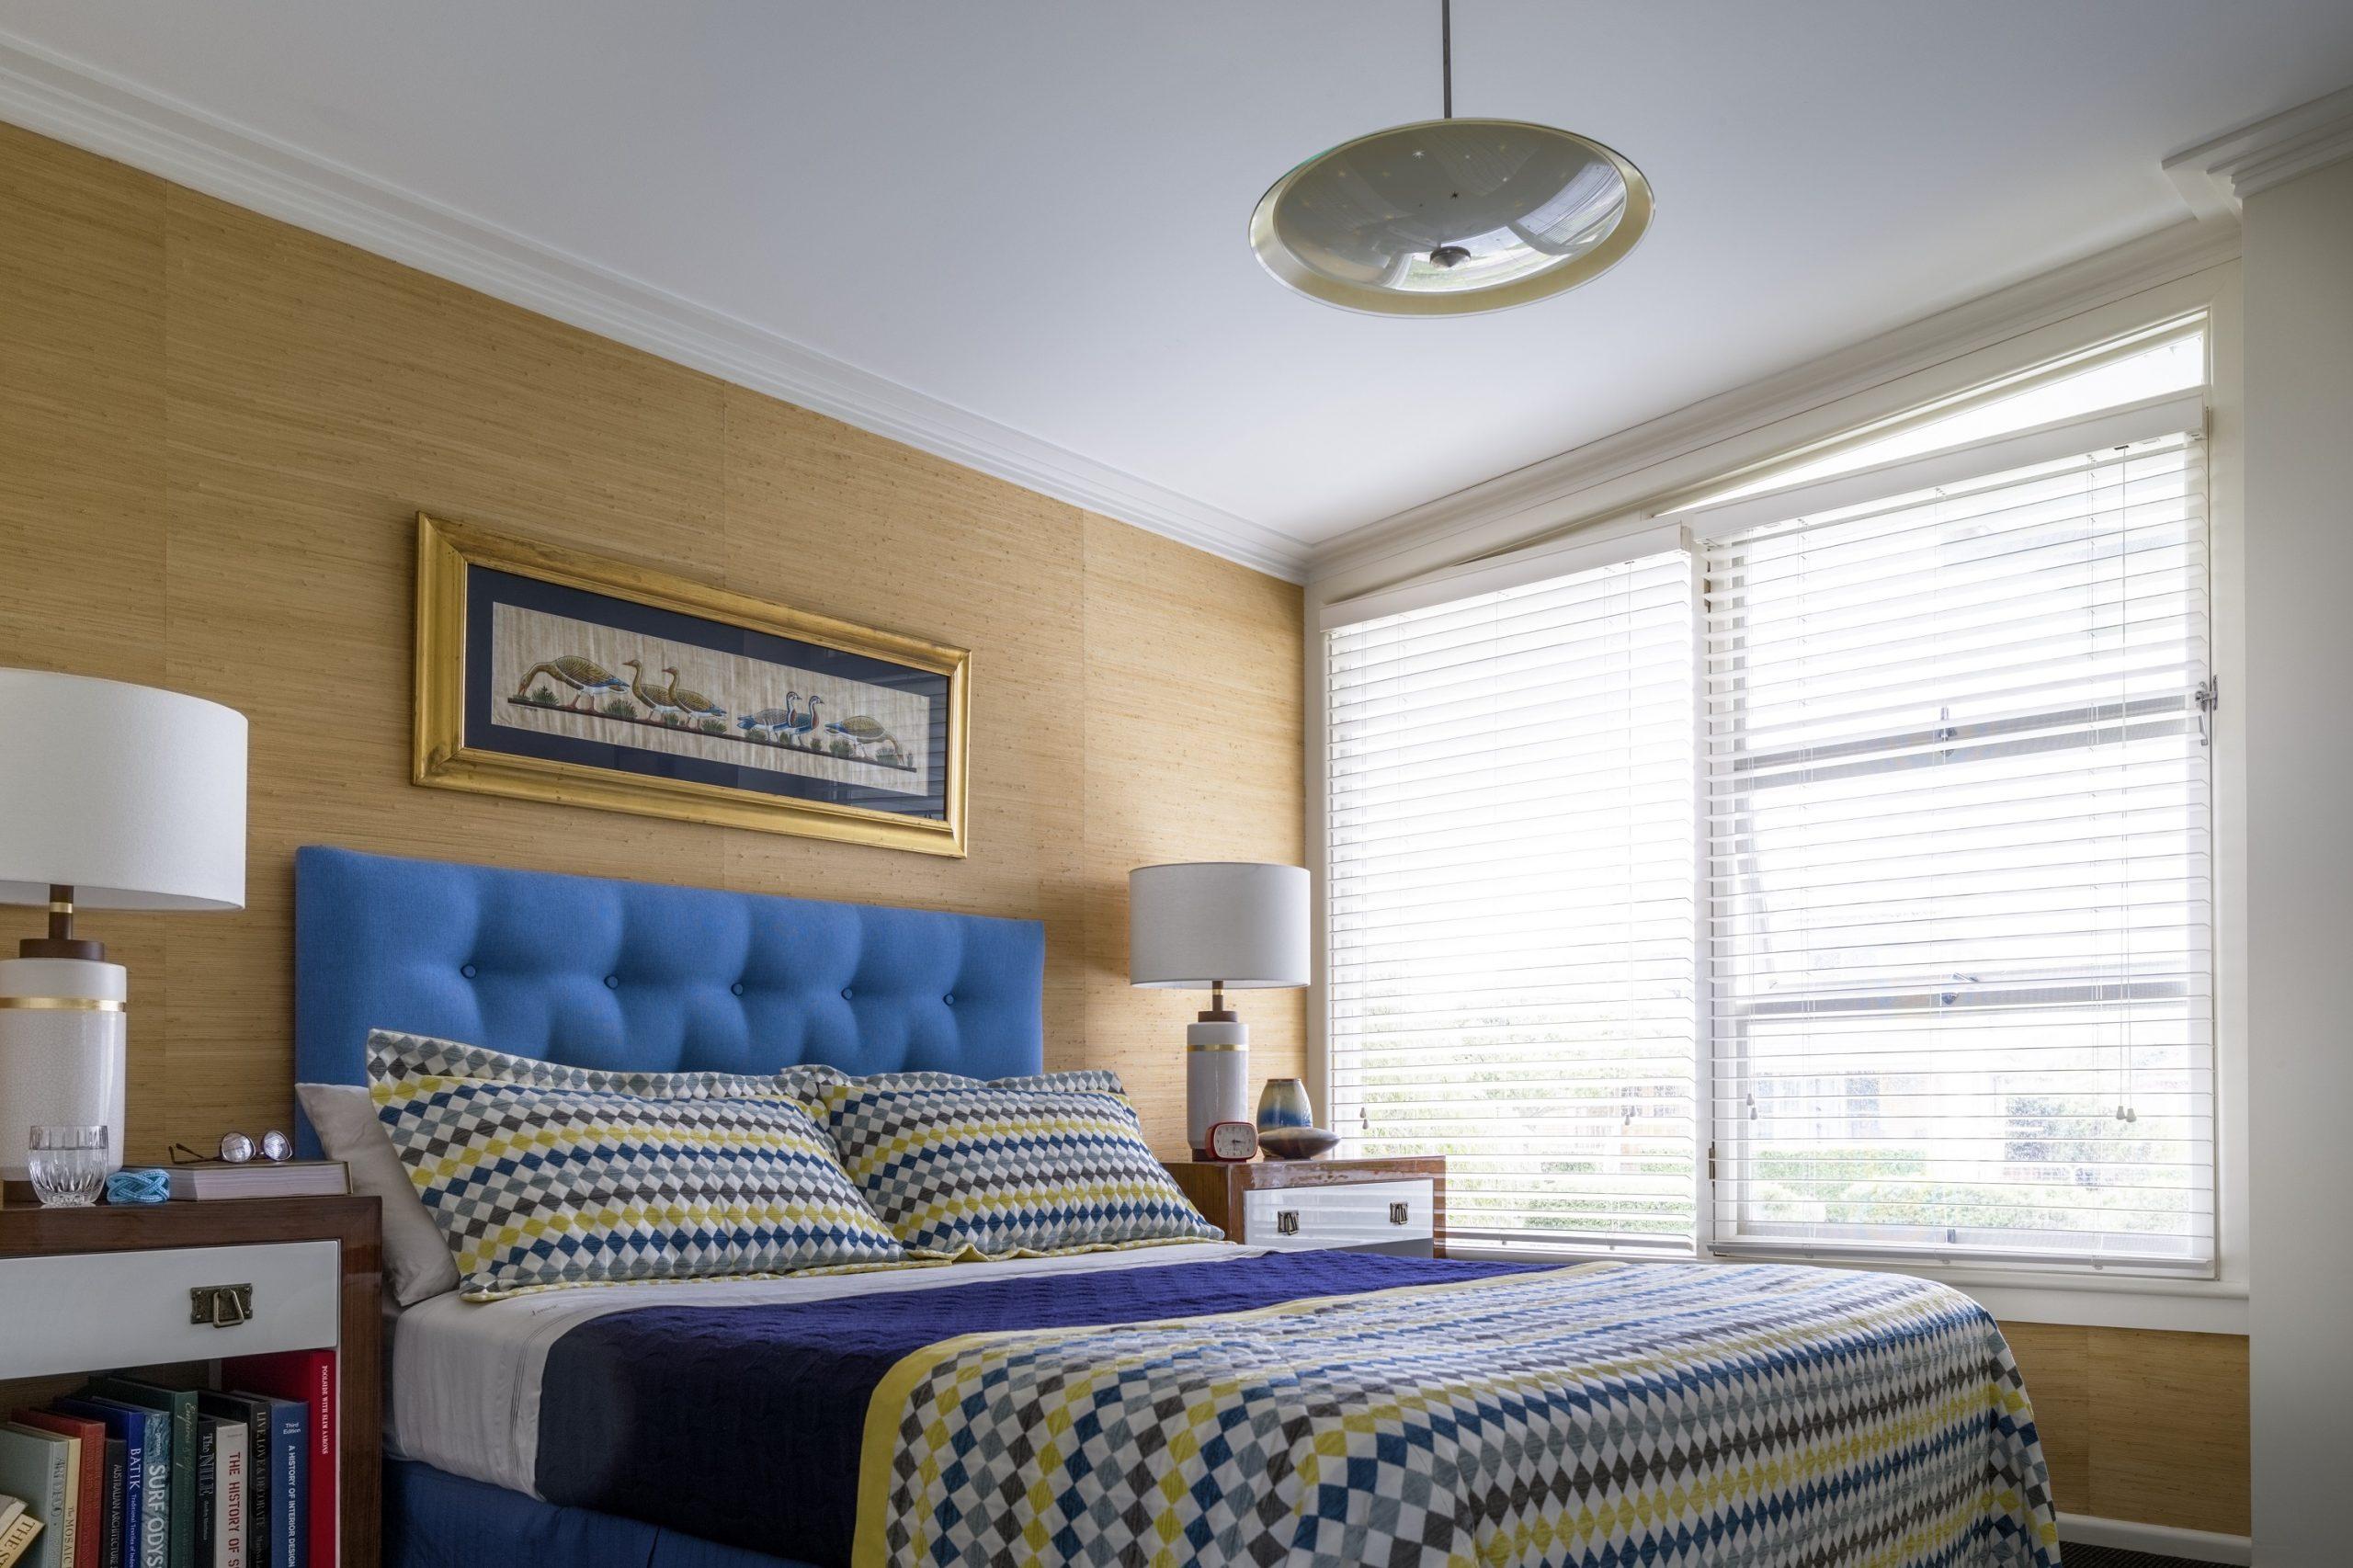 Retro-Interior-Design-1970s-Bedroom-Renovation-Kiama-Michael-Bell-Architects-Sydney